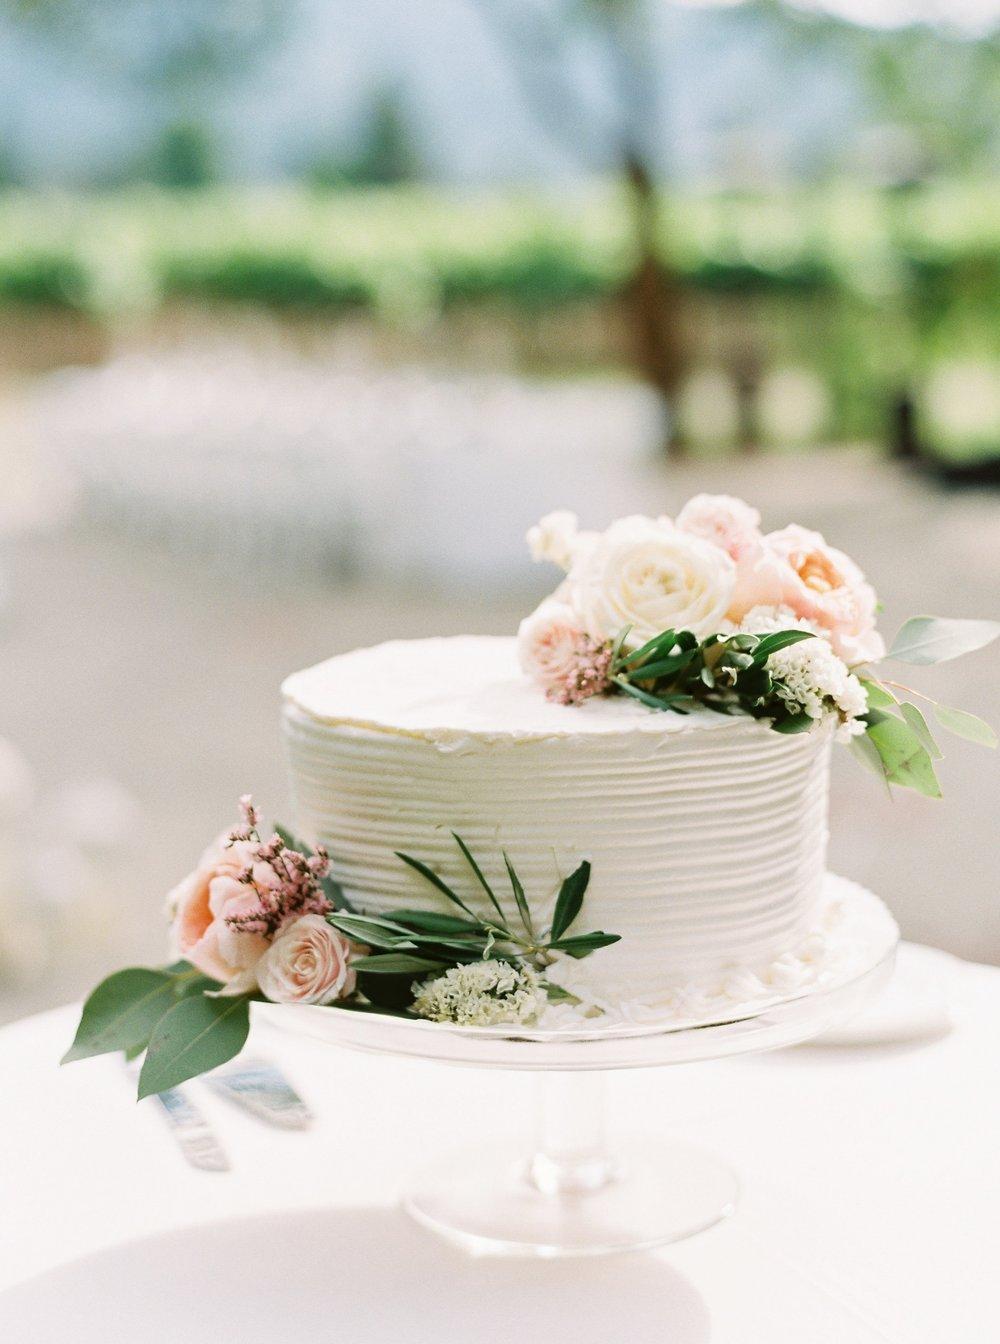 Harvest-inn-wedding-in-napa-california-52.jpg